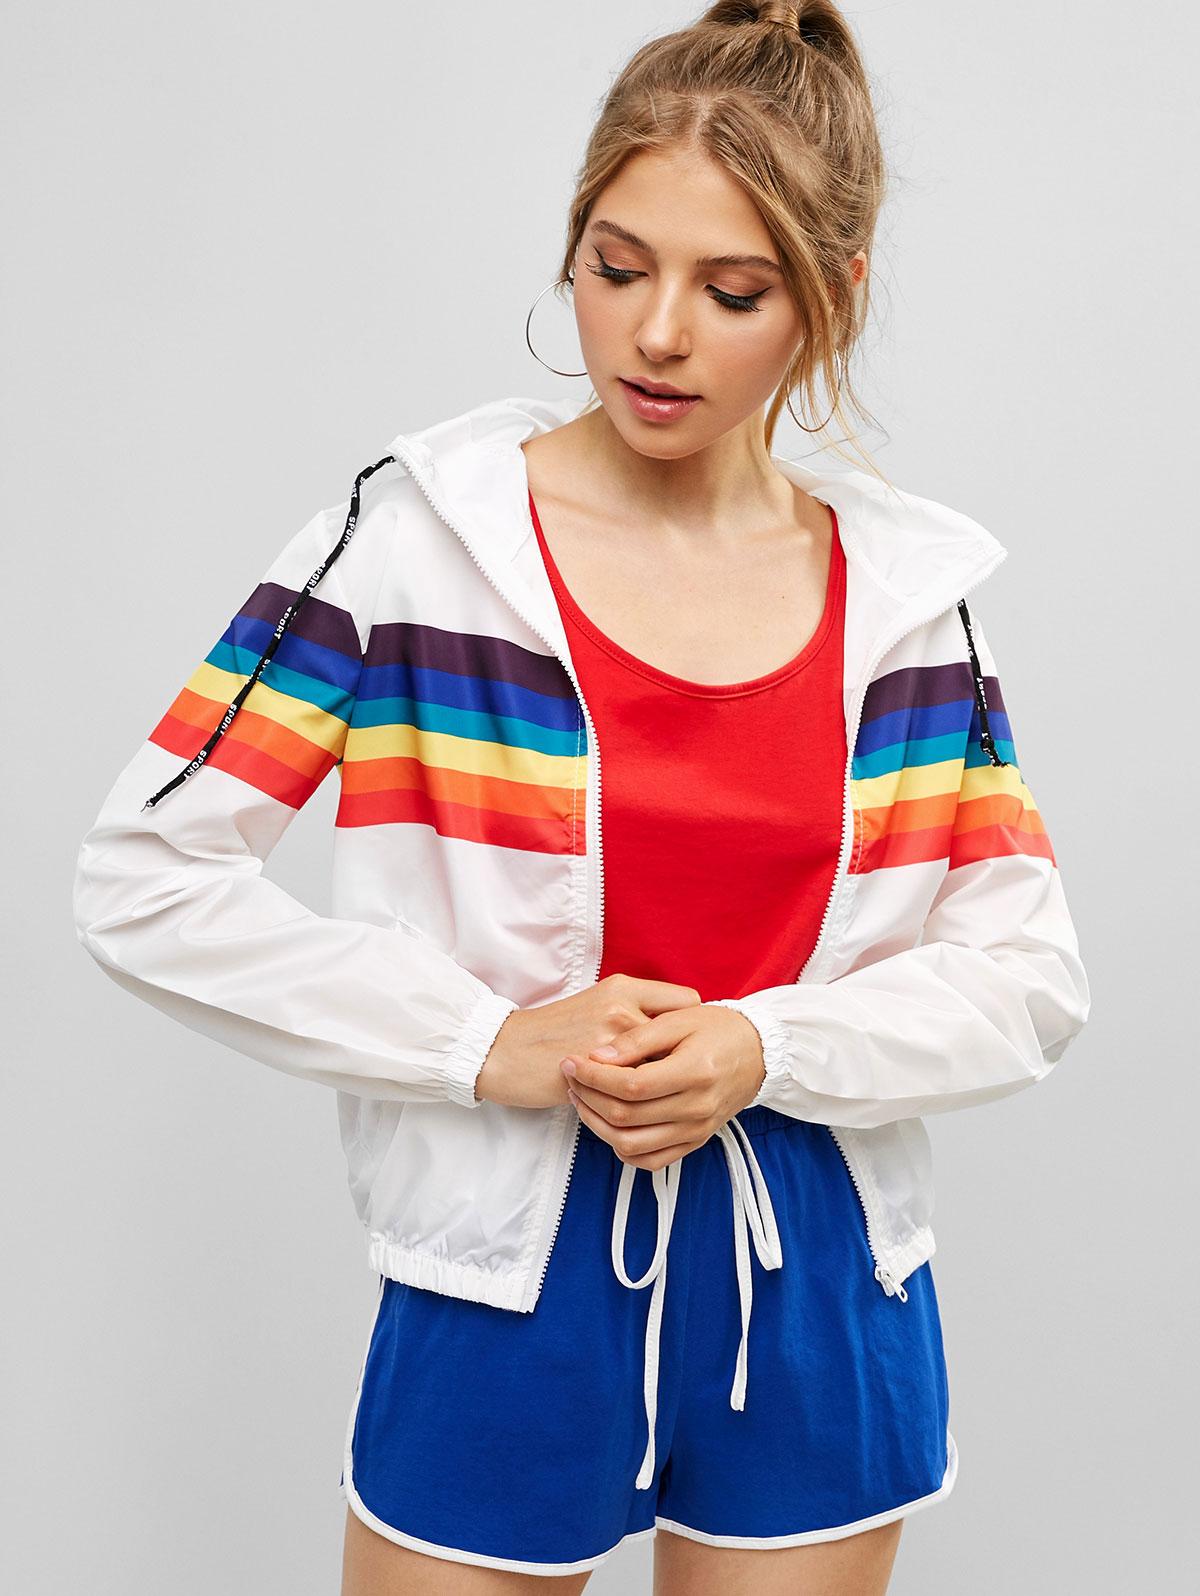 ZAFUL Spring Autumn Sweatshirt Windbreaker   Jacket   Women Rainbow Zipper Pockets Hooded Coats Casual Long Sleeves   Basic     Jackets